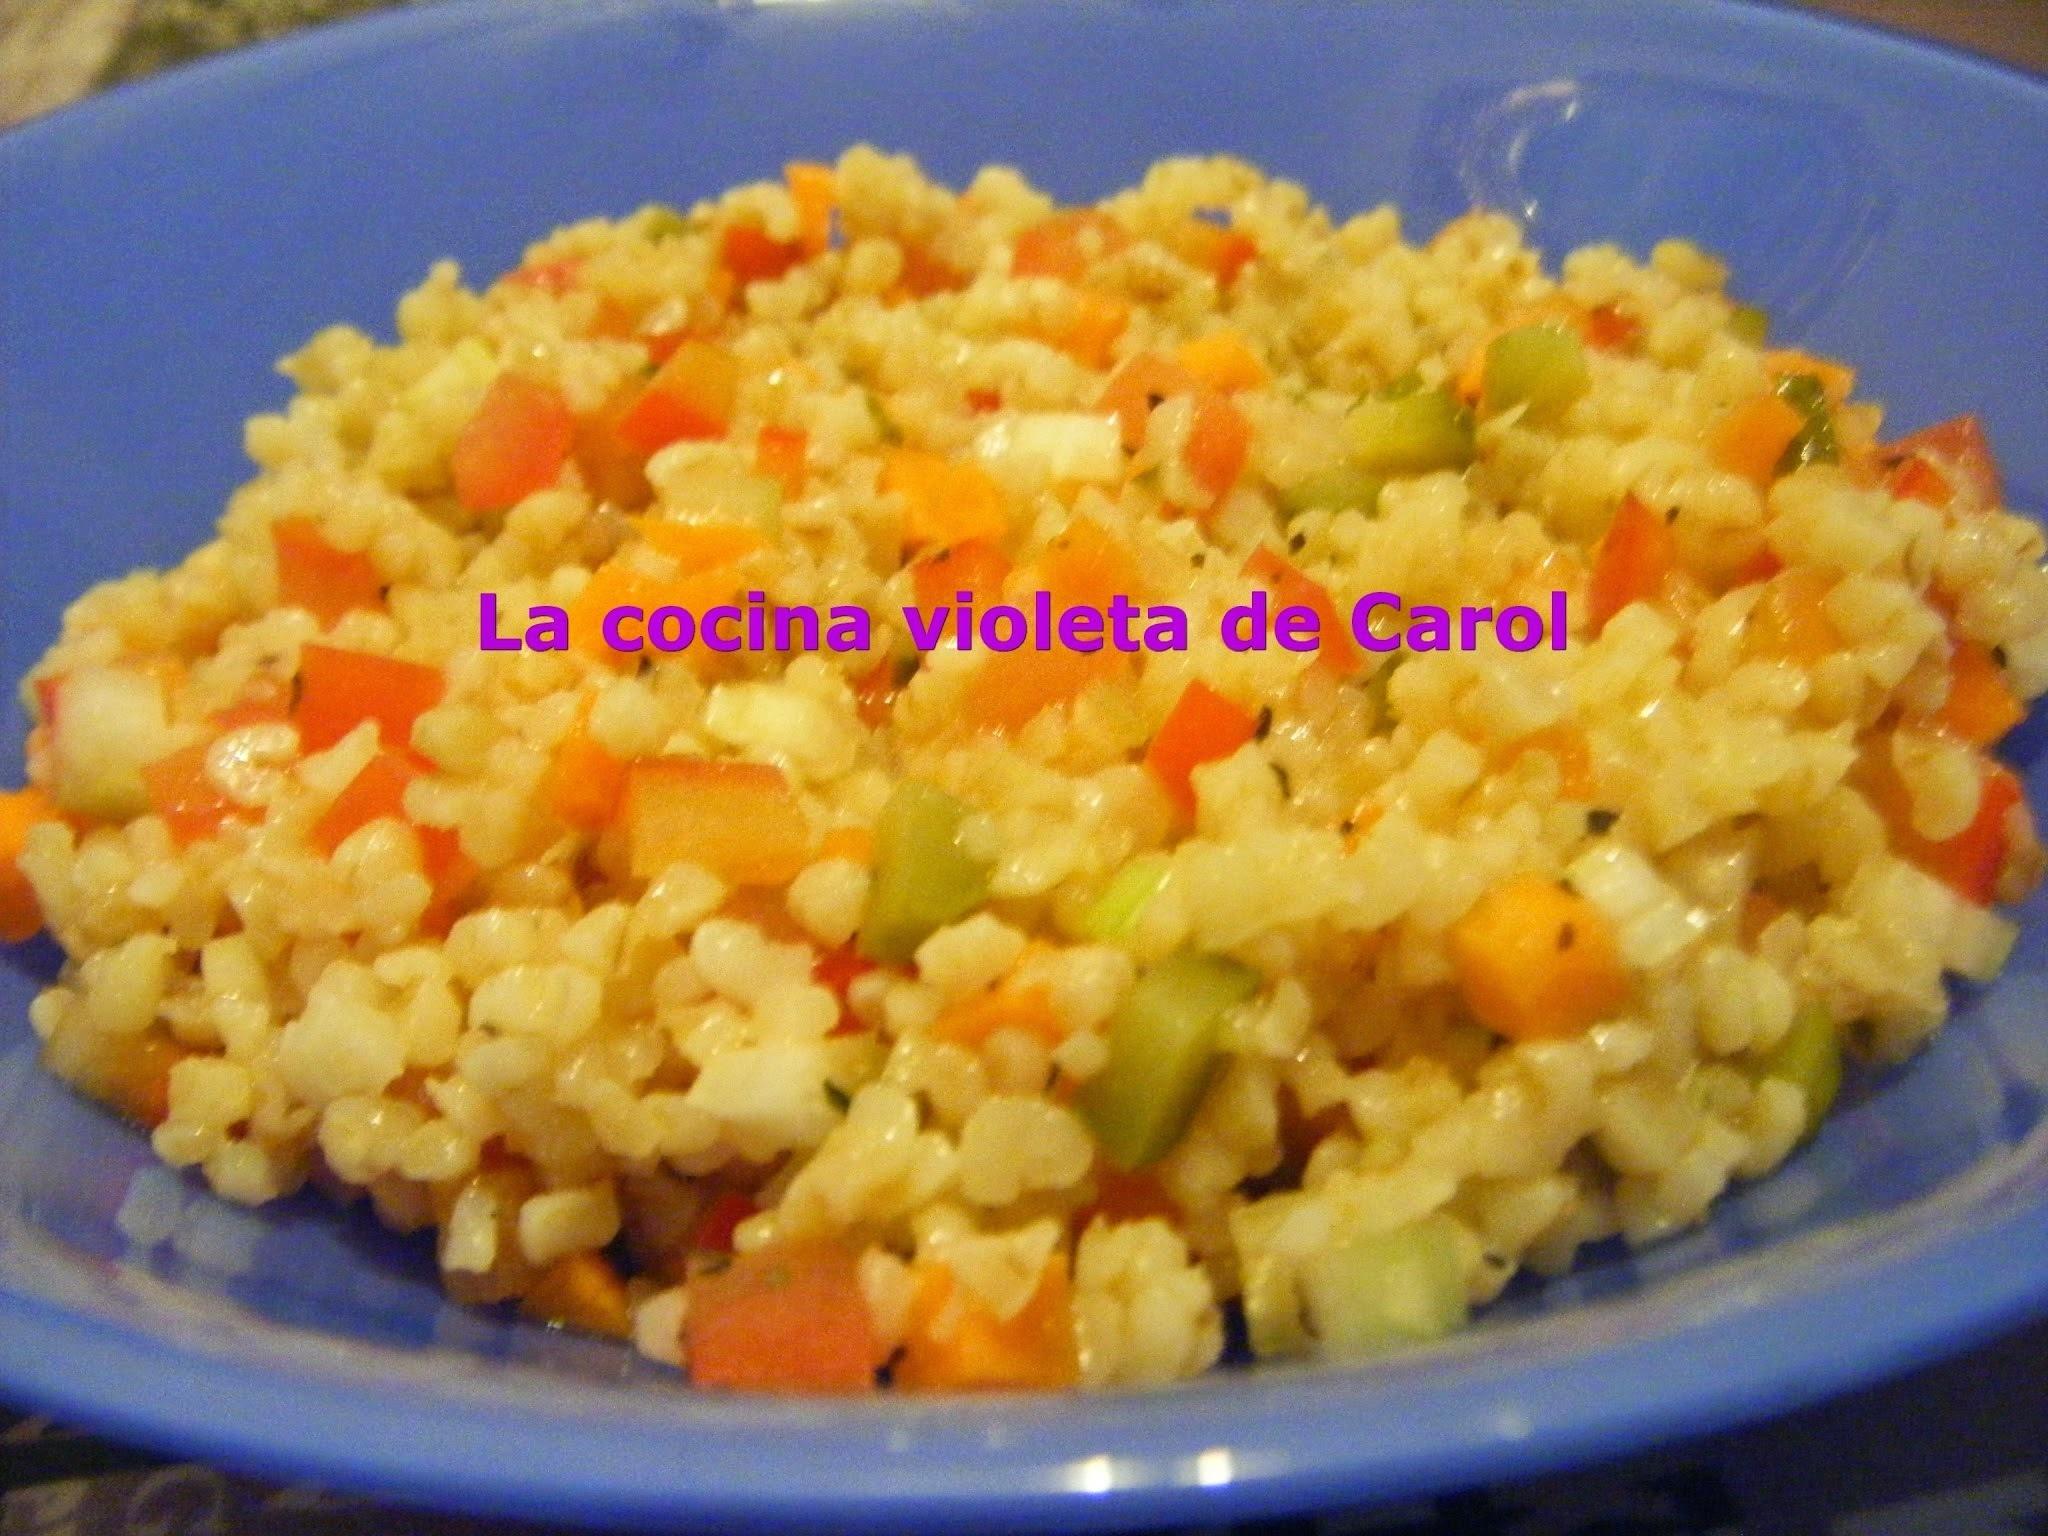 Www.cocina.facilisimo.com | Recetas De Cocina Facilisimo Com Recetas Mytaste